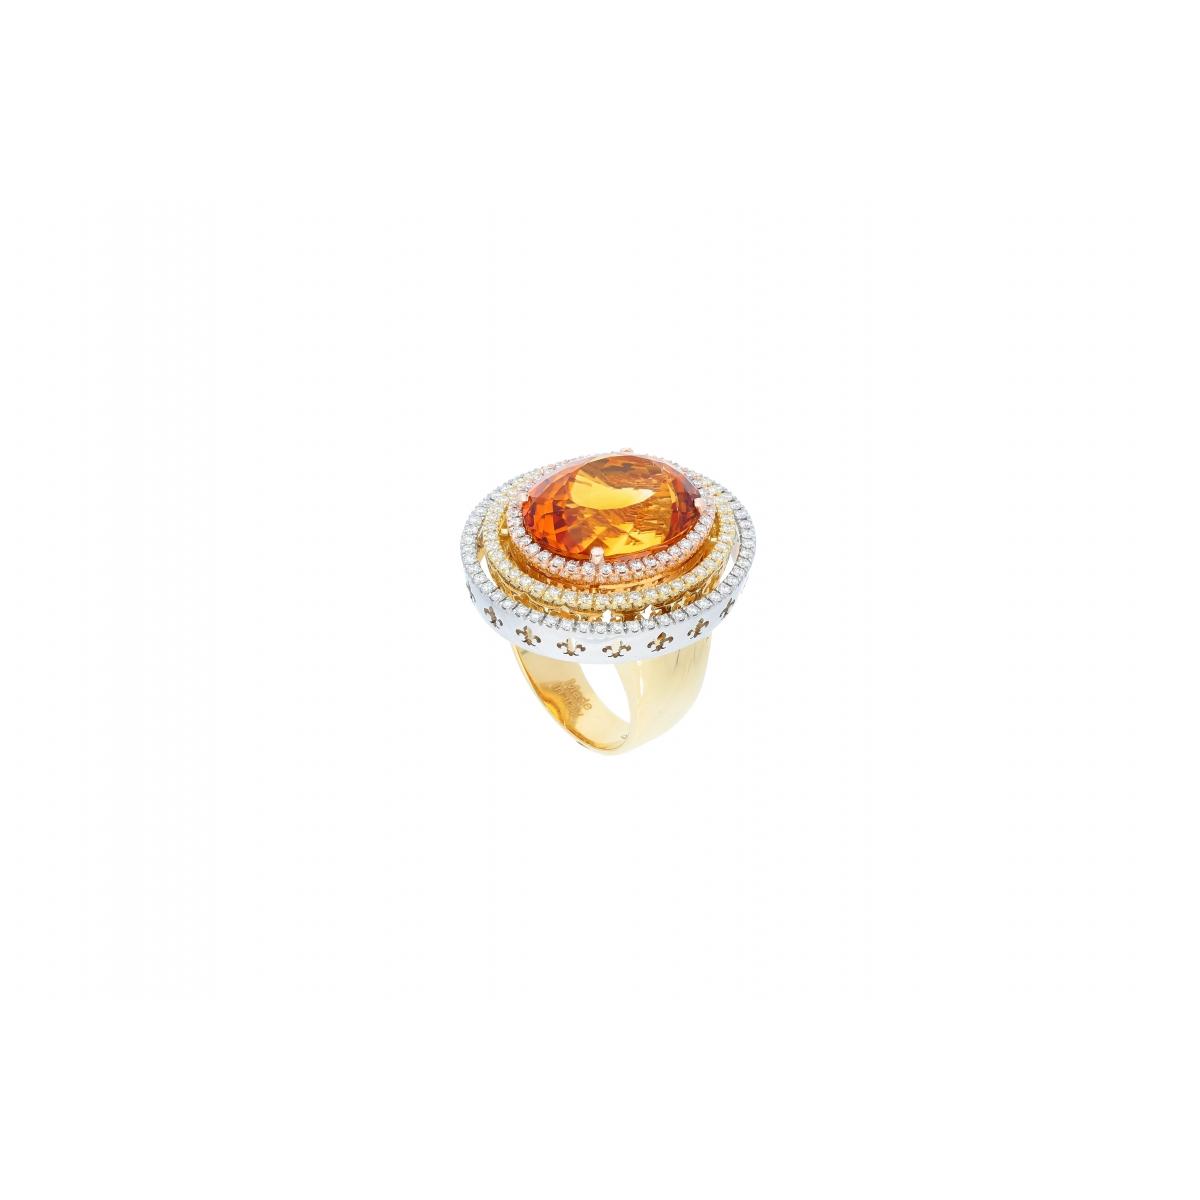 Saturno Collection Ring Orange Citrine and diamonds in three